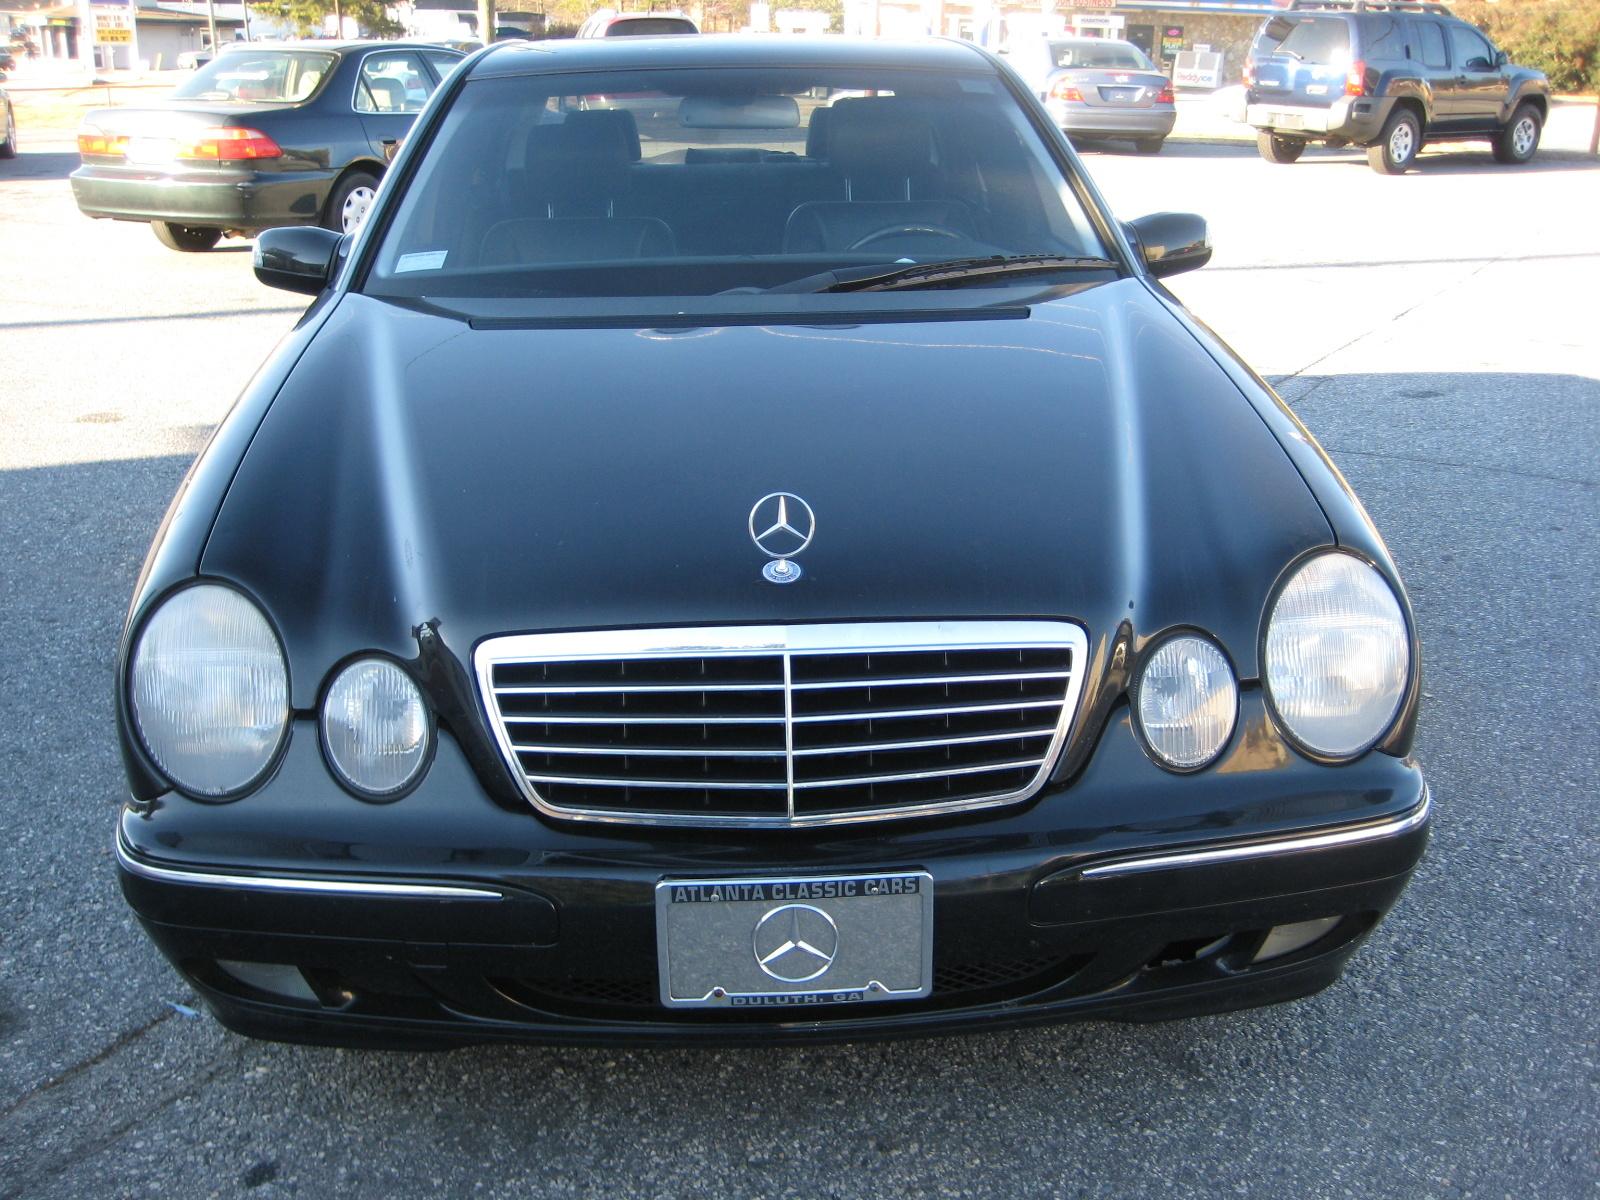 2000 Mercedes-Benz E-Class - Pictures - CarGurus